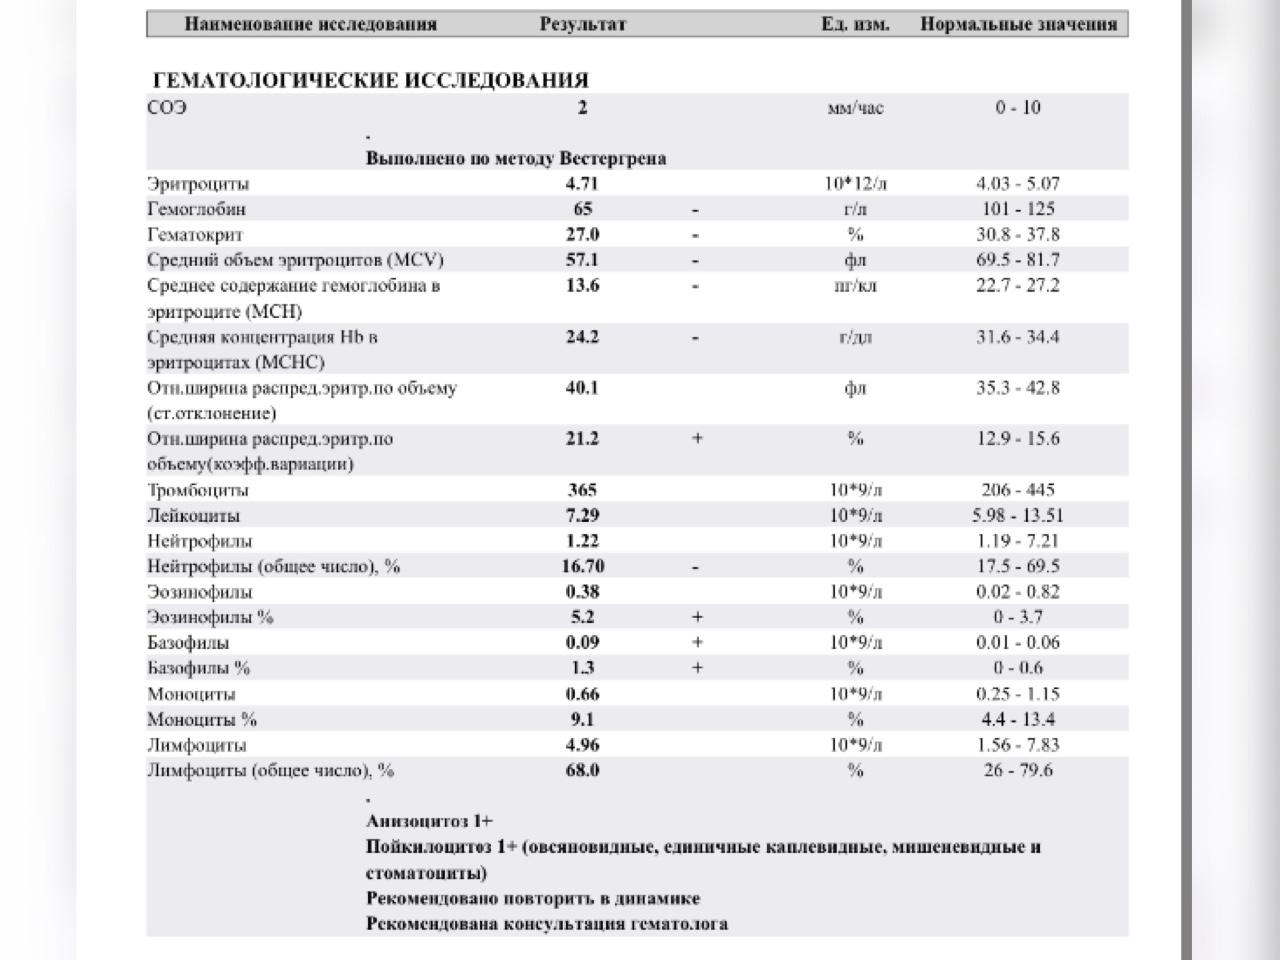 Повышена средняя концентрация hb в эритроцитах мснс у ребенка — причины и последствия